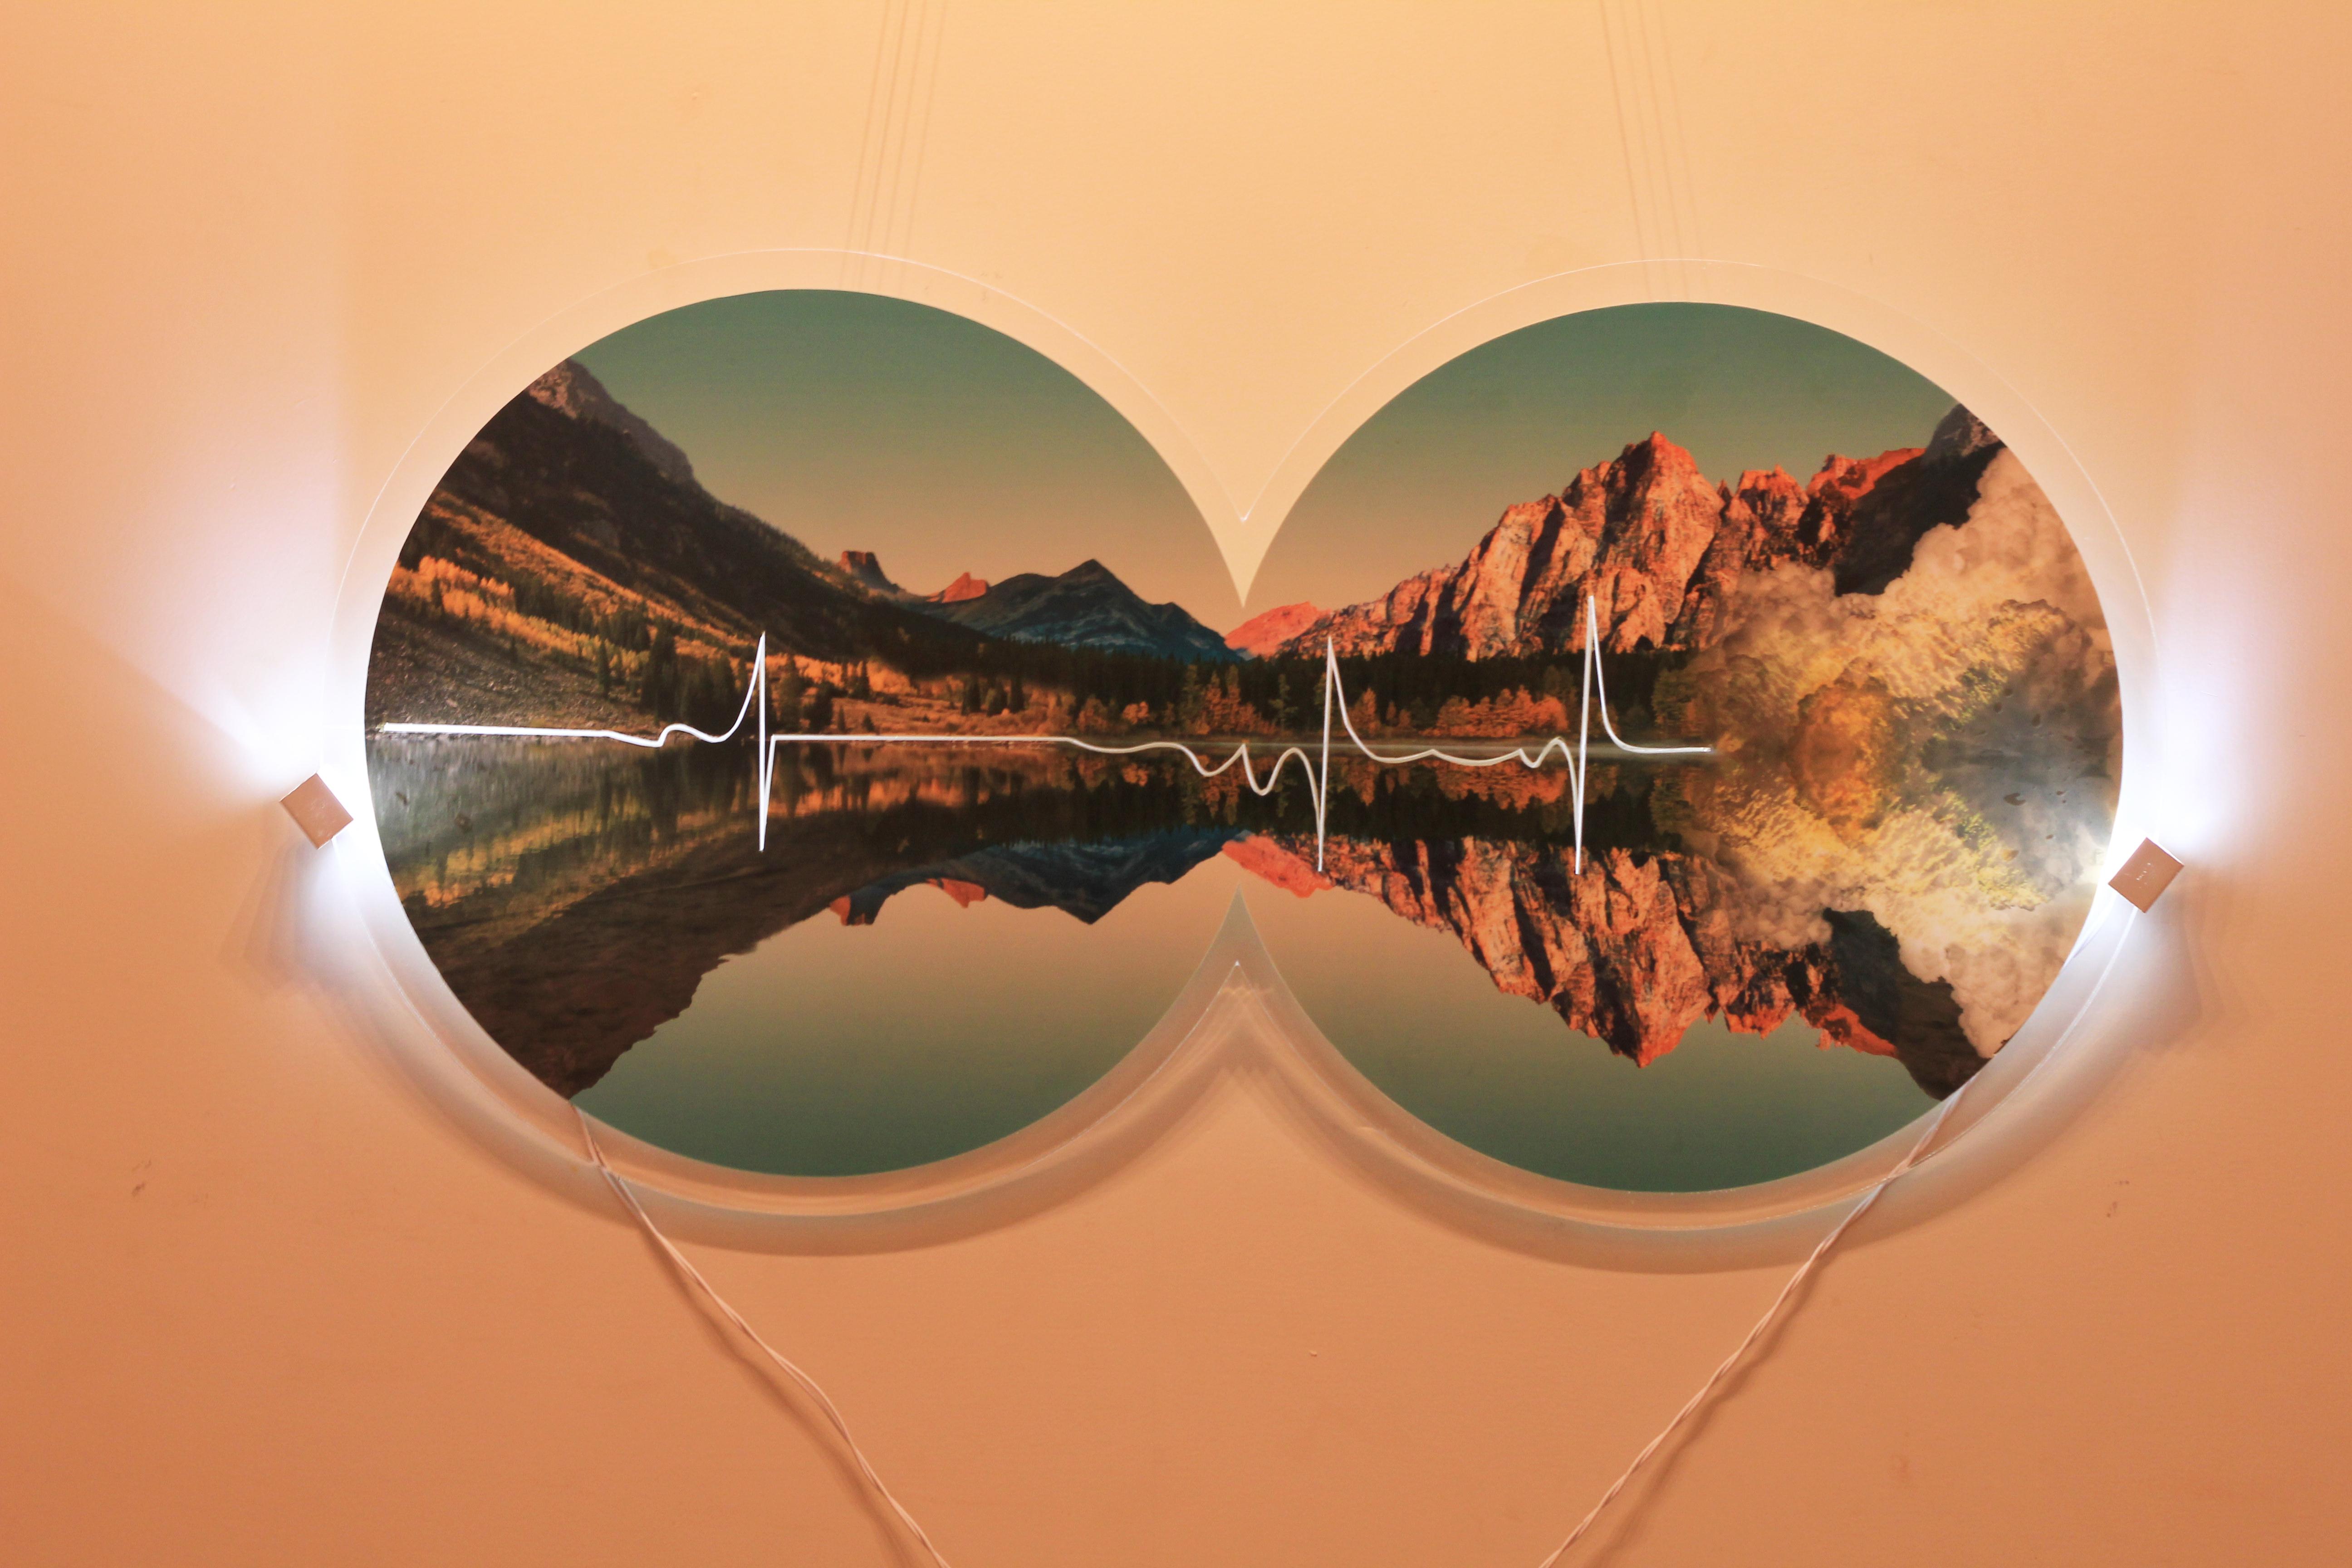 14. Aamir Habib - Highway to Heaven - Photo Print, Acrylic,